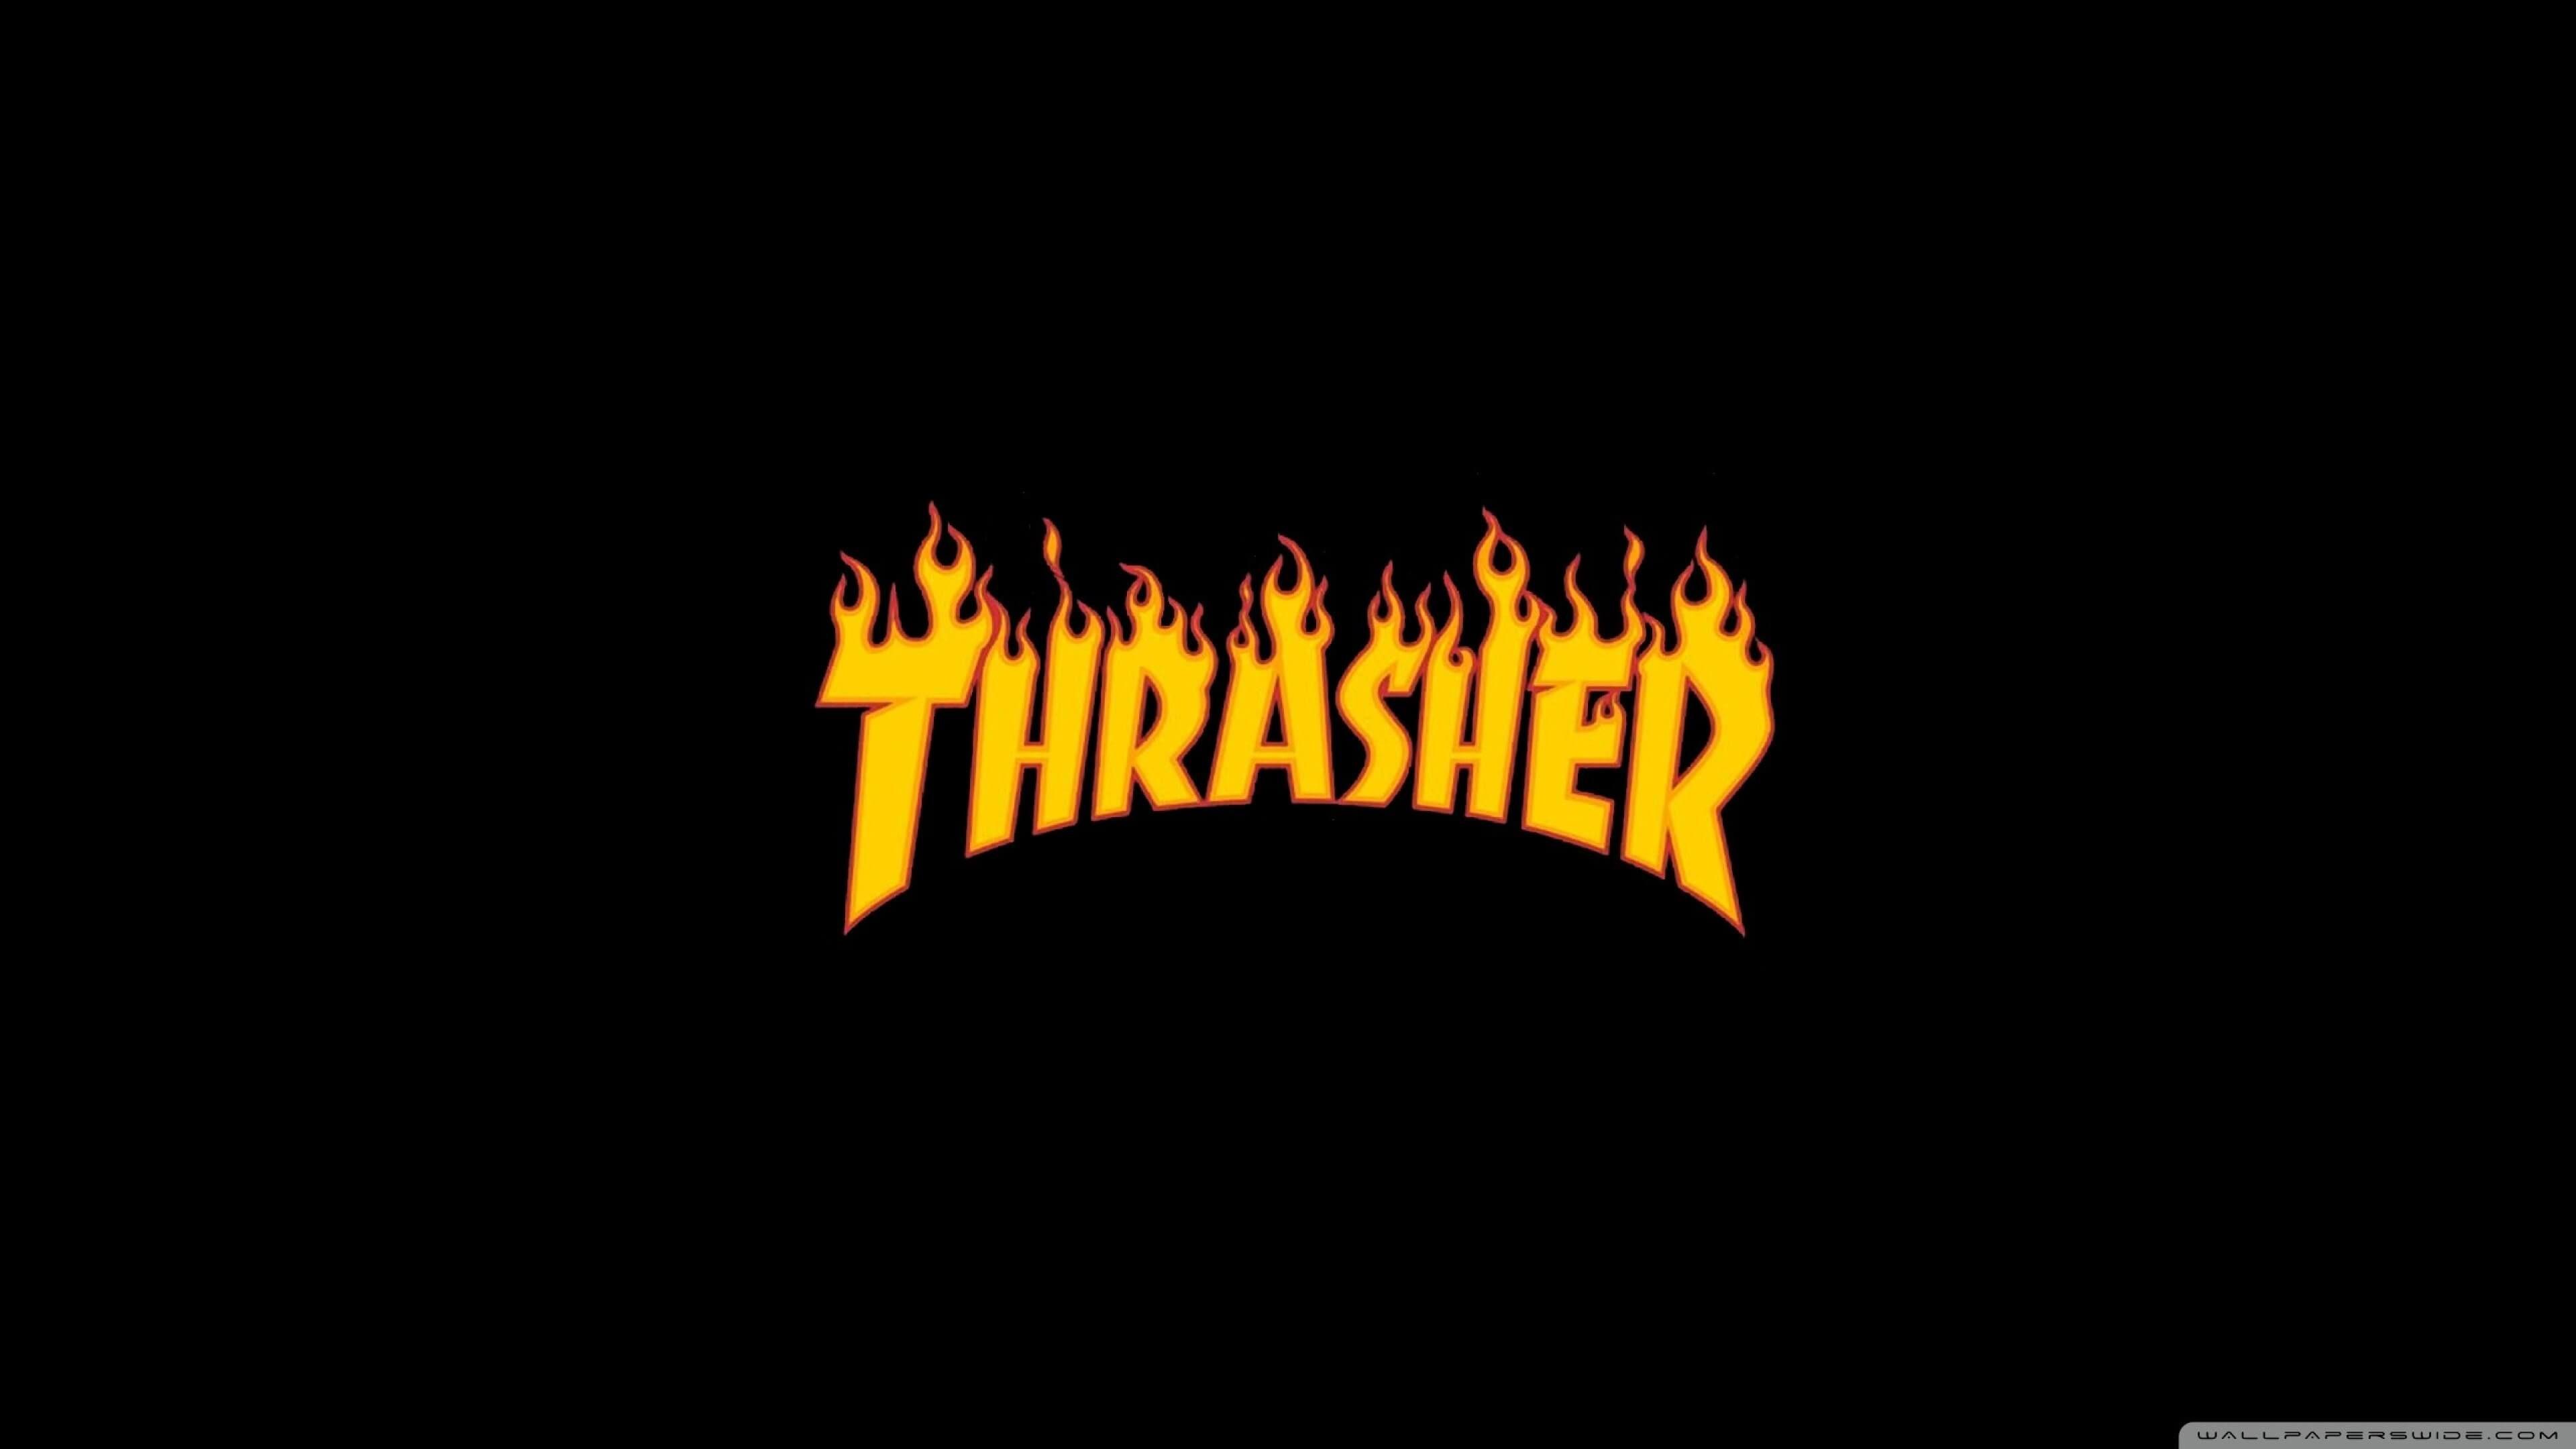 Thrasher Wallpaper 4K HD Desktop Imagem de fundo de